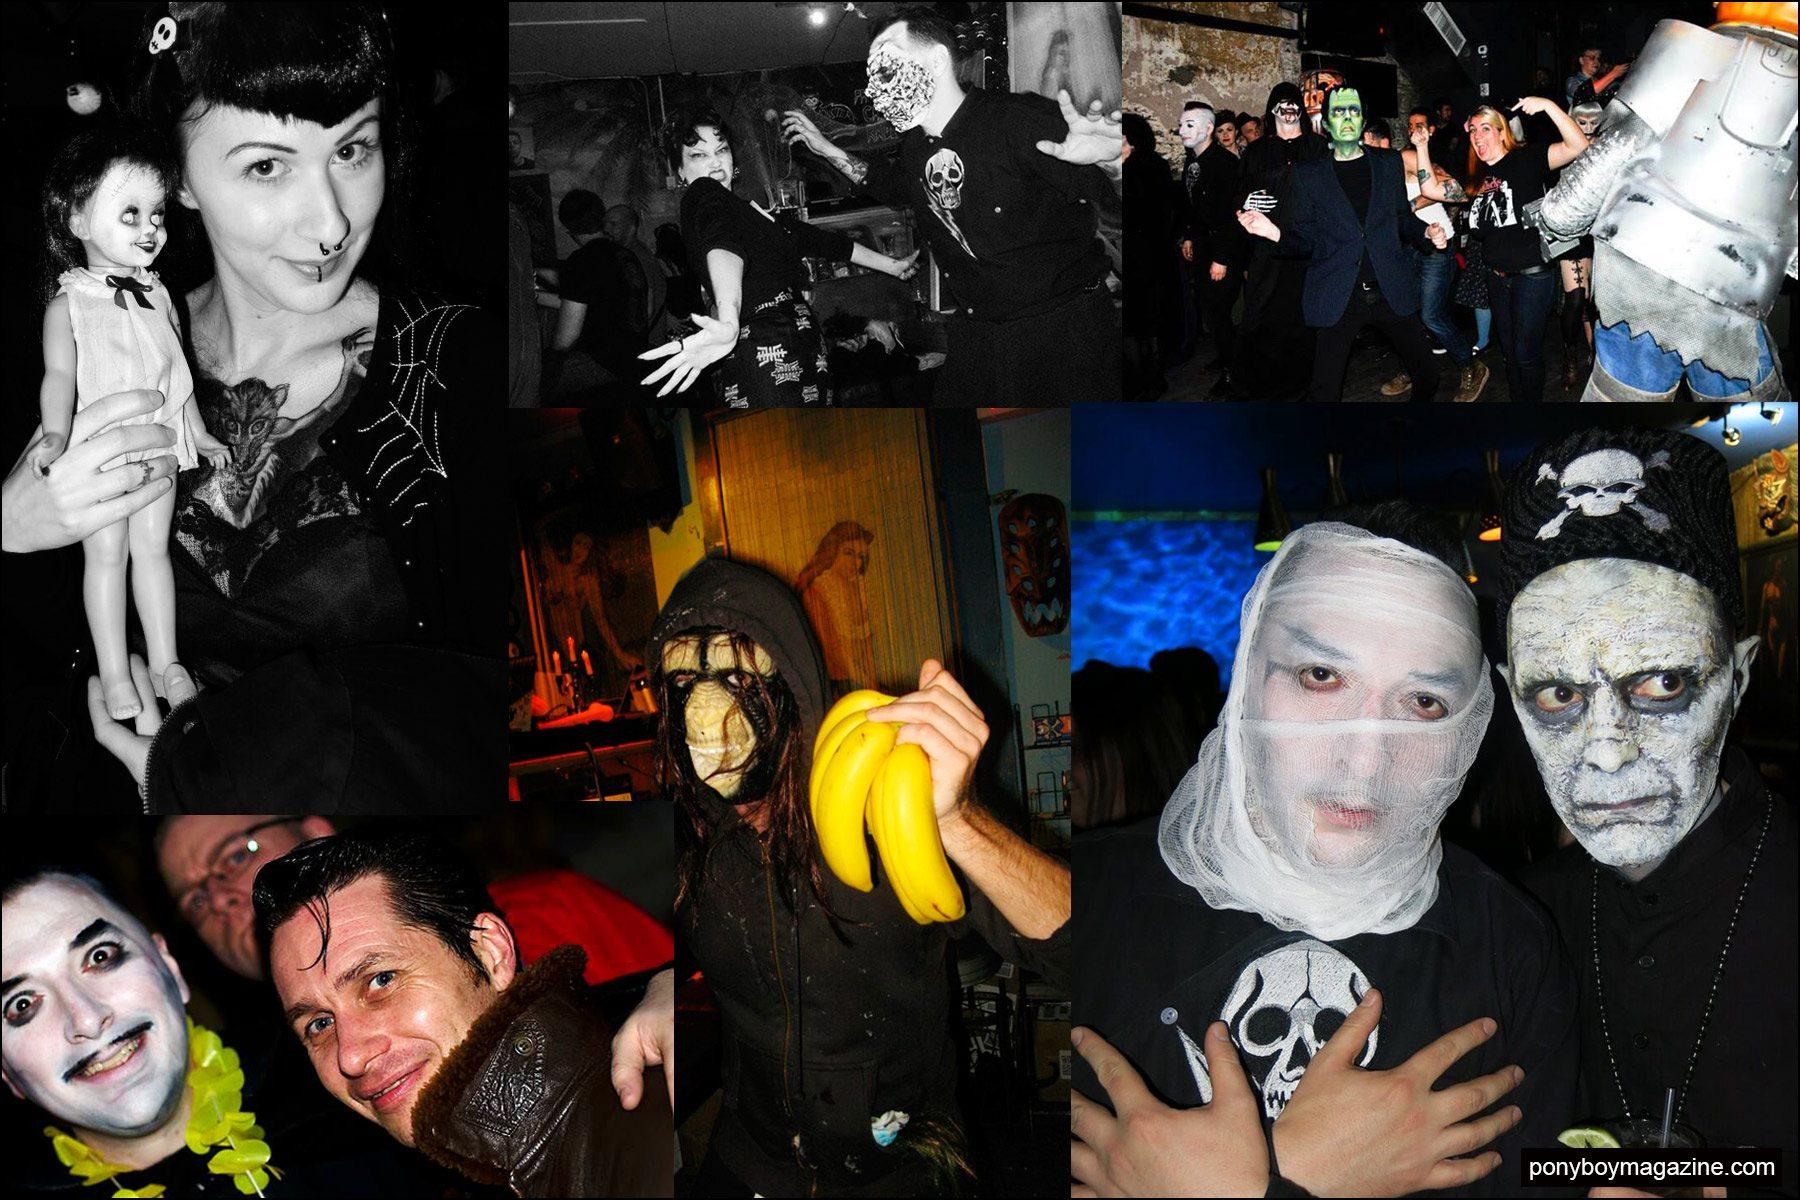 Snapshots of partygoers at New York City's Midnite Monster Hop event. Ponyboy magazine NY.